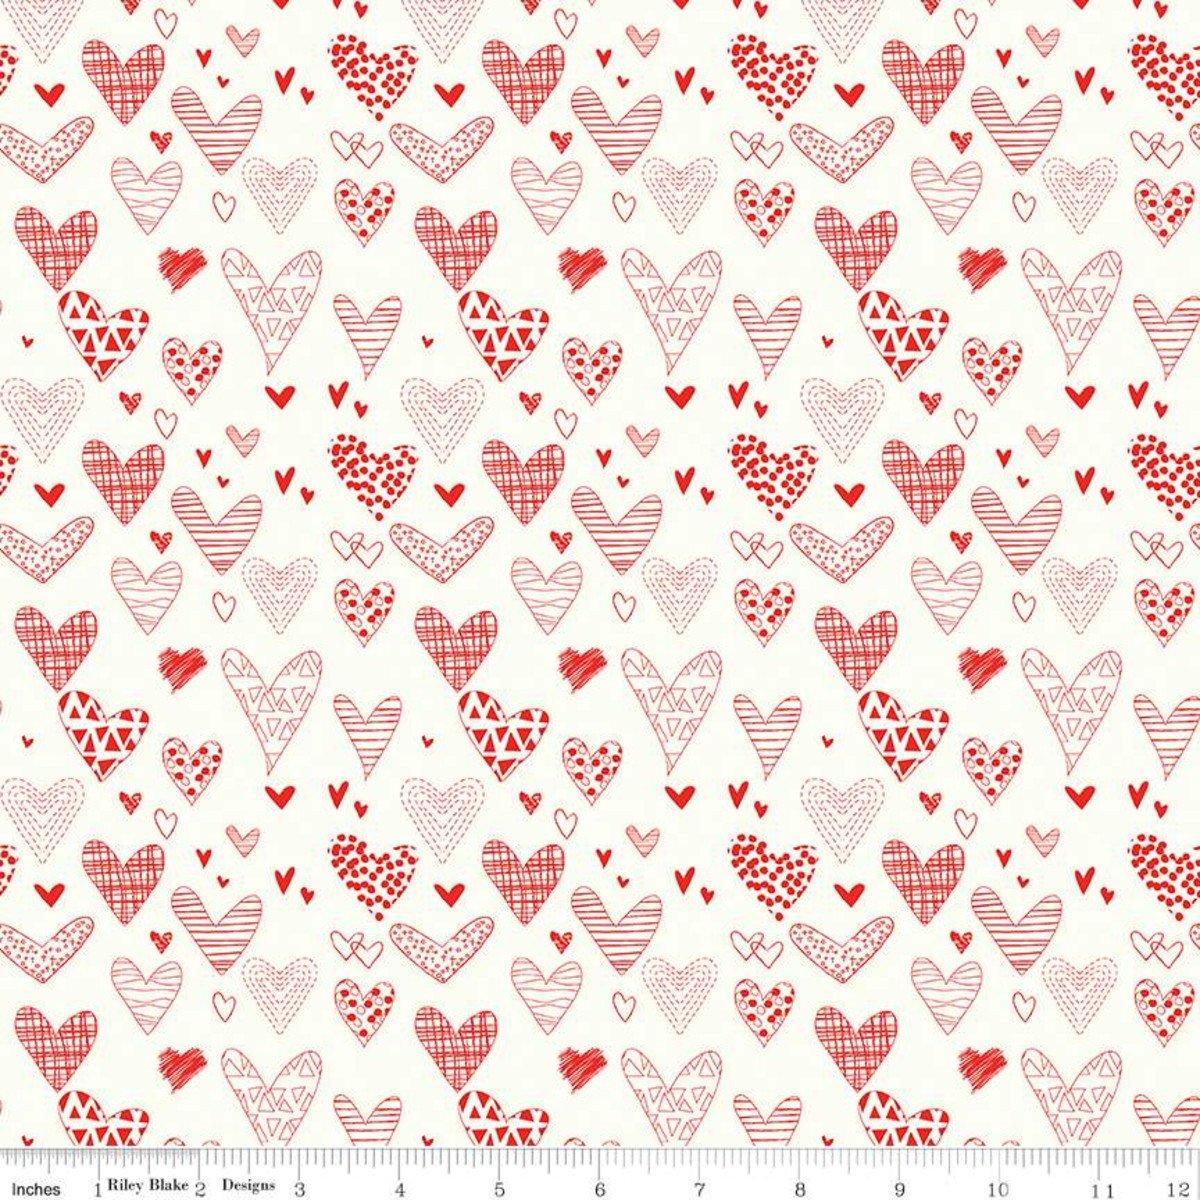 Riley Blake, From the Heart - Cream Hearts